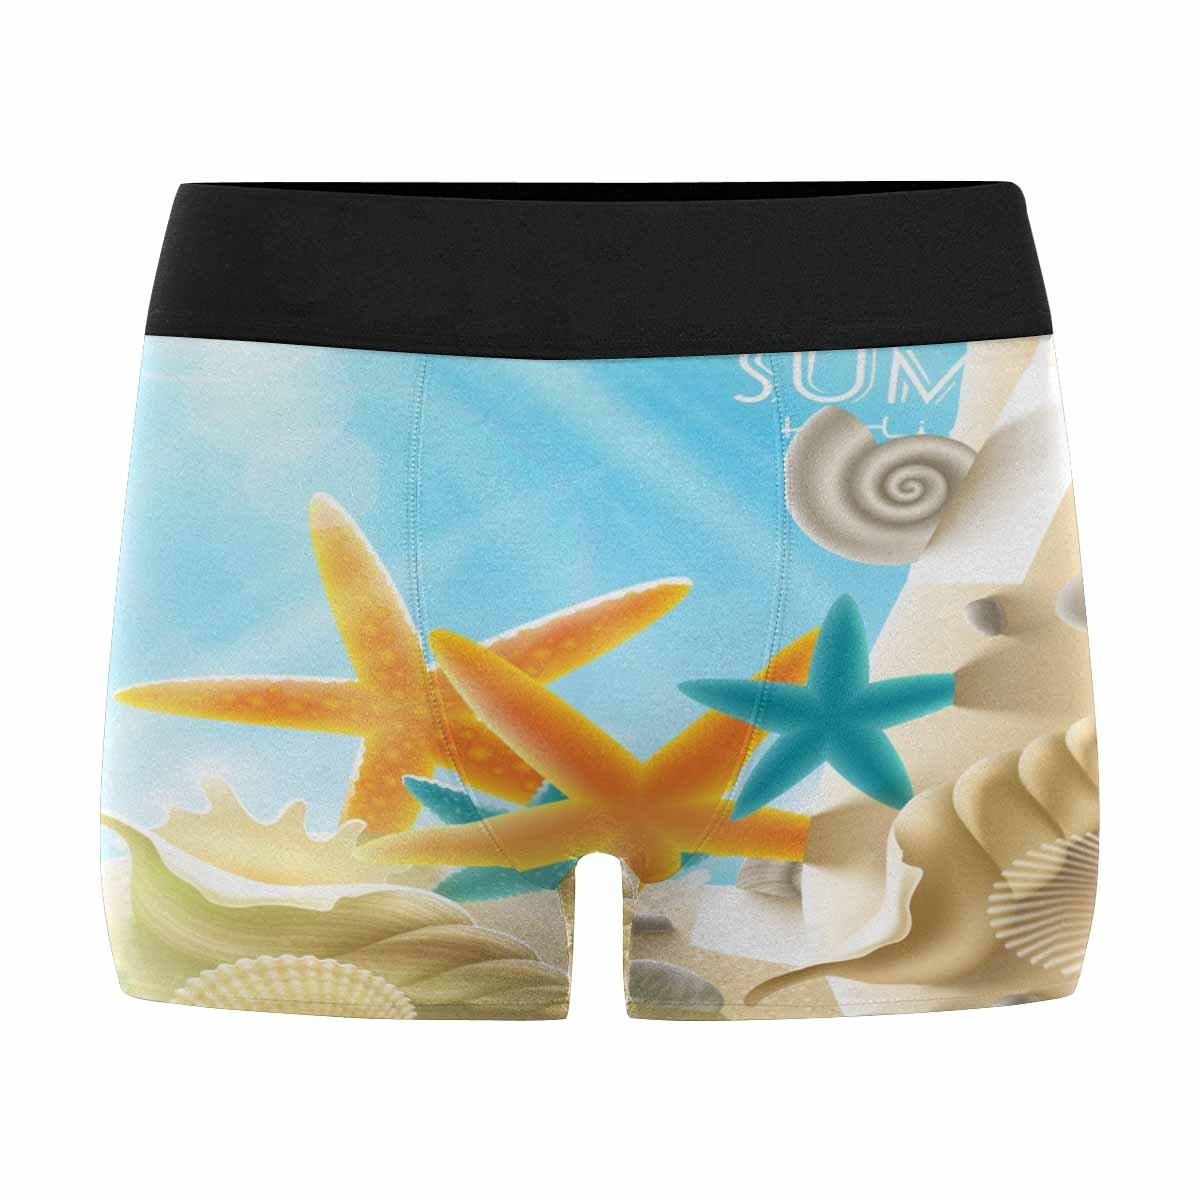 INTERESTPRINT Mens Boxer Briefs Underwear Summer Holidays Sea Inhabitants on a Beach Sand Against a Sunny Seascape XS-3XL